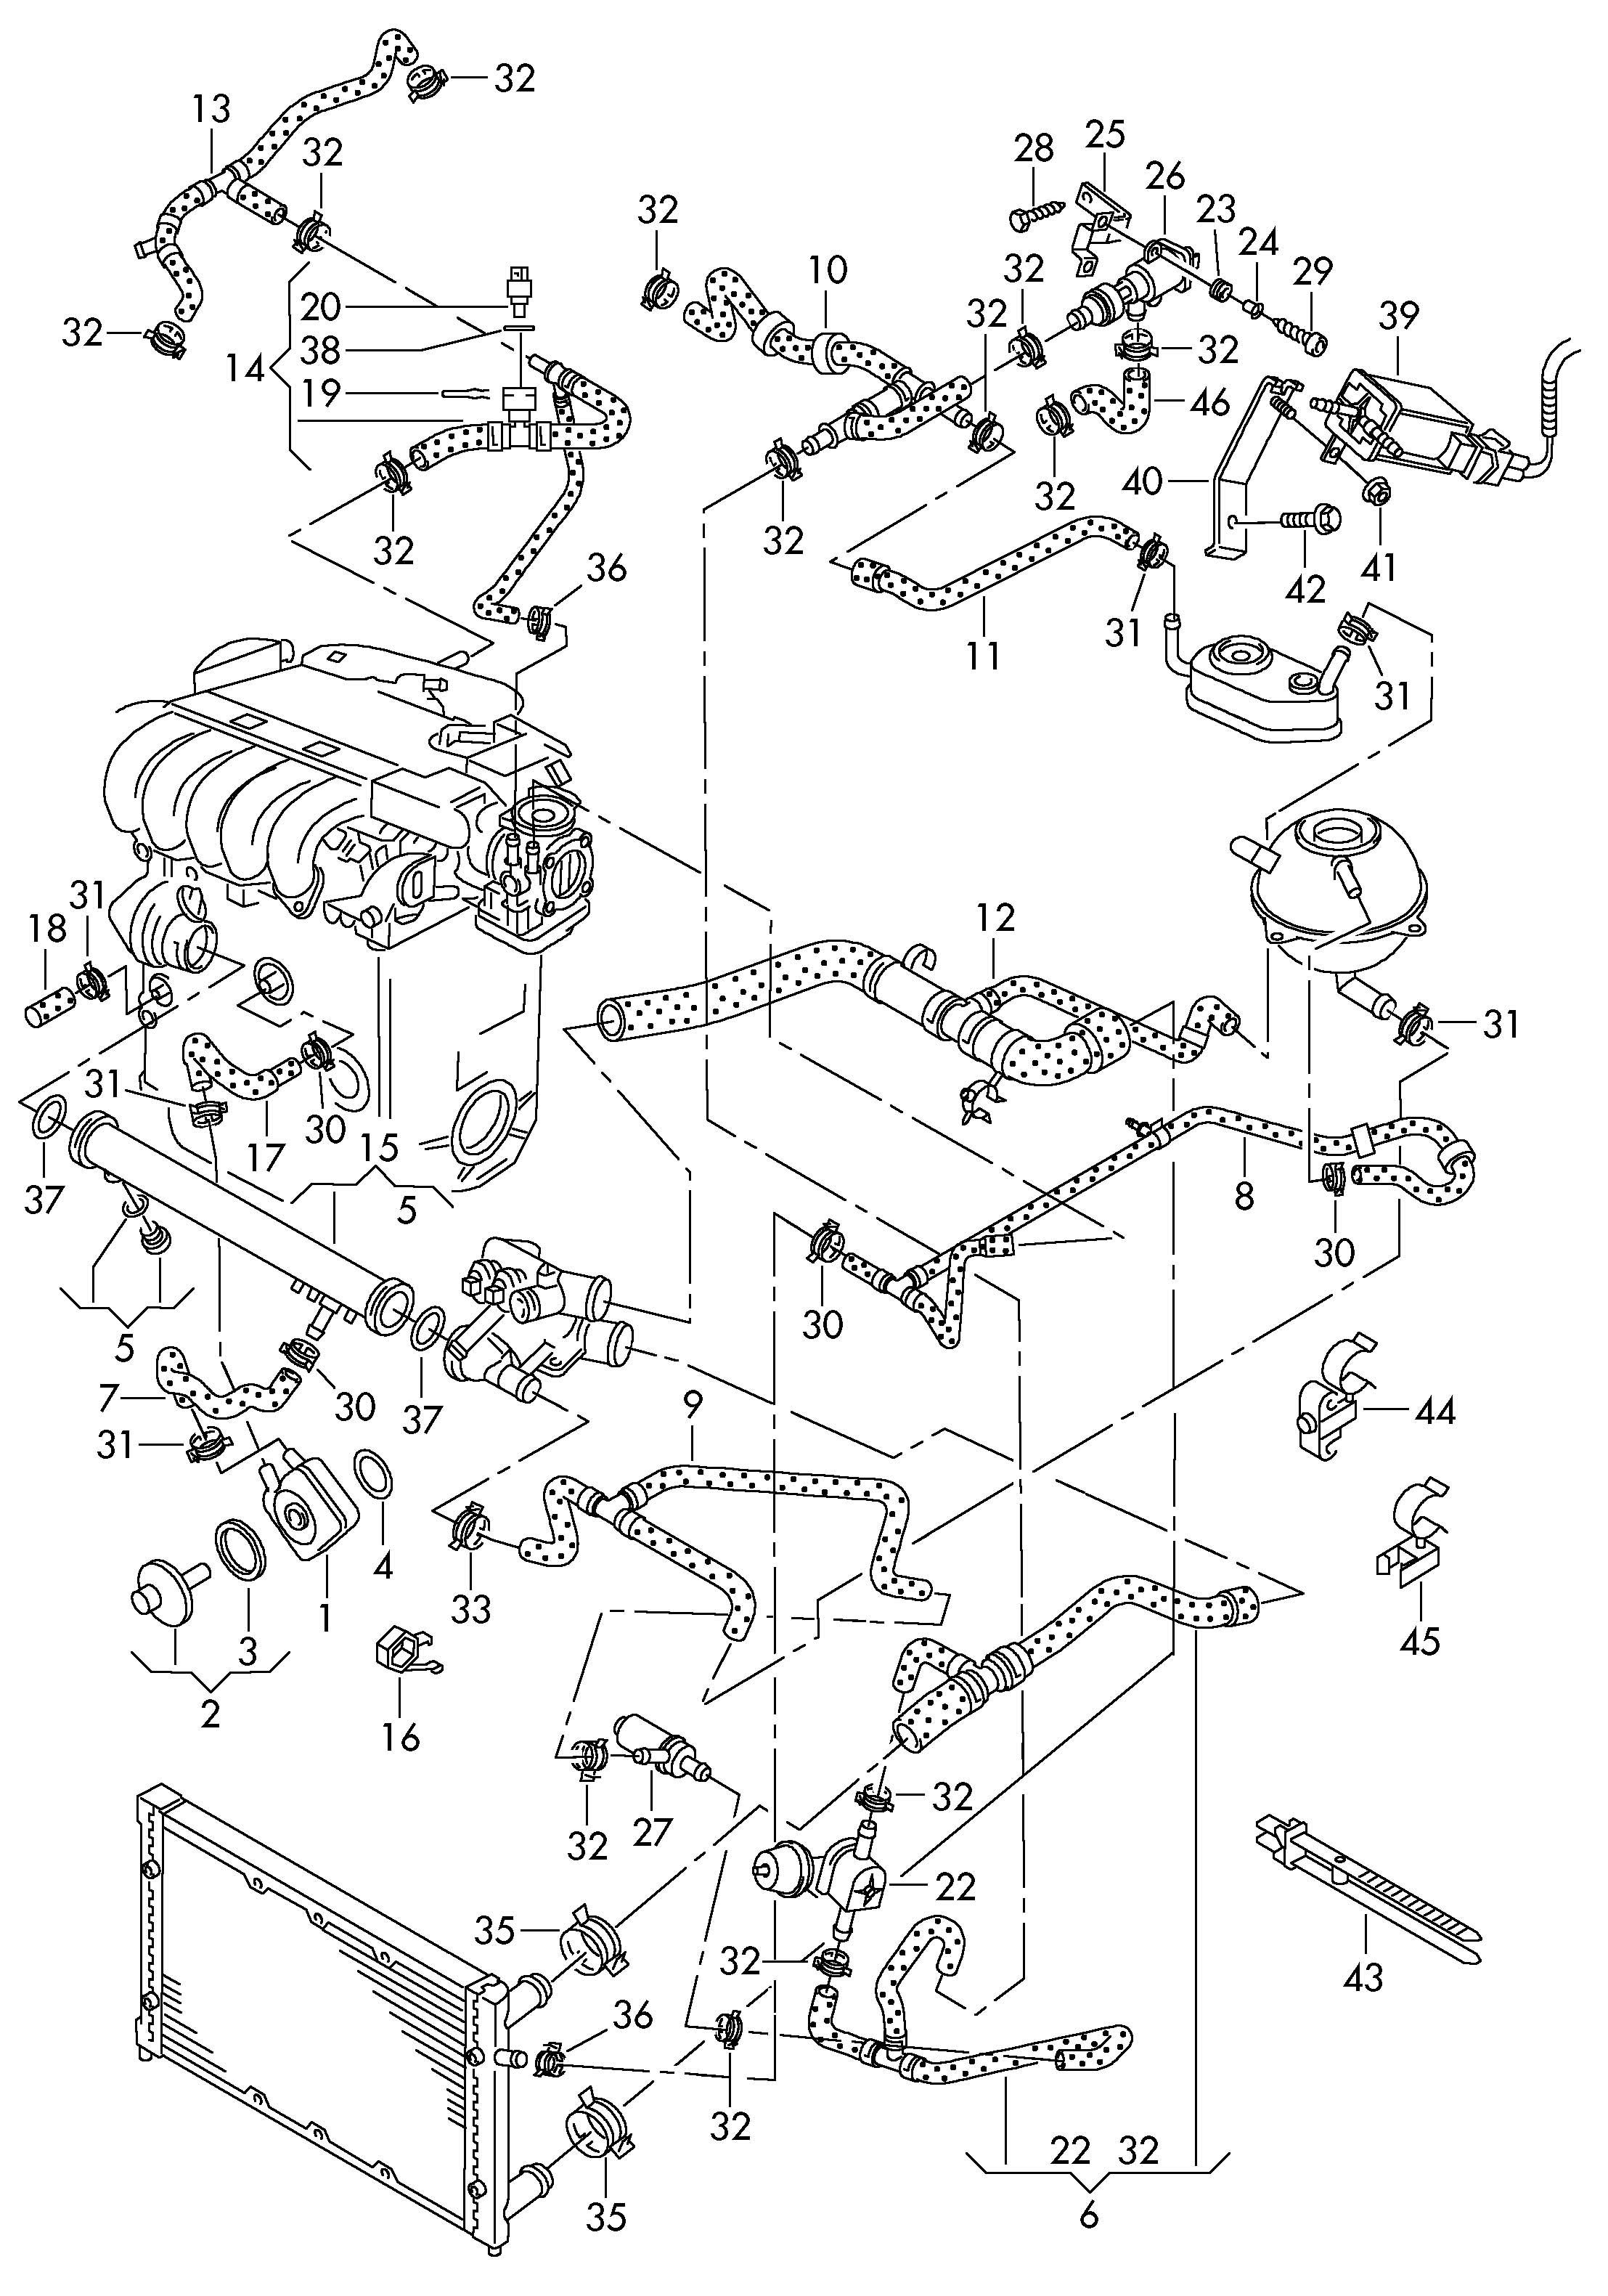 mk1 golf gti fuel pump wiring diagram venn word problems with 3 circles vw rabbit 2 5 engine auto